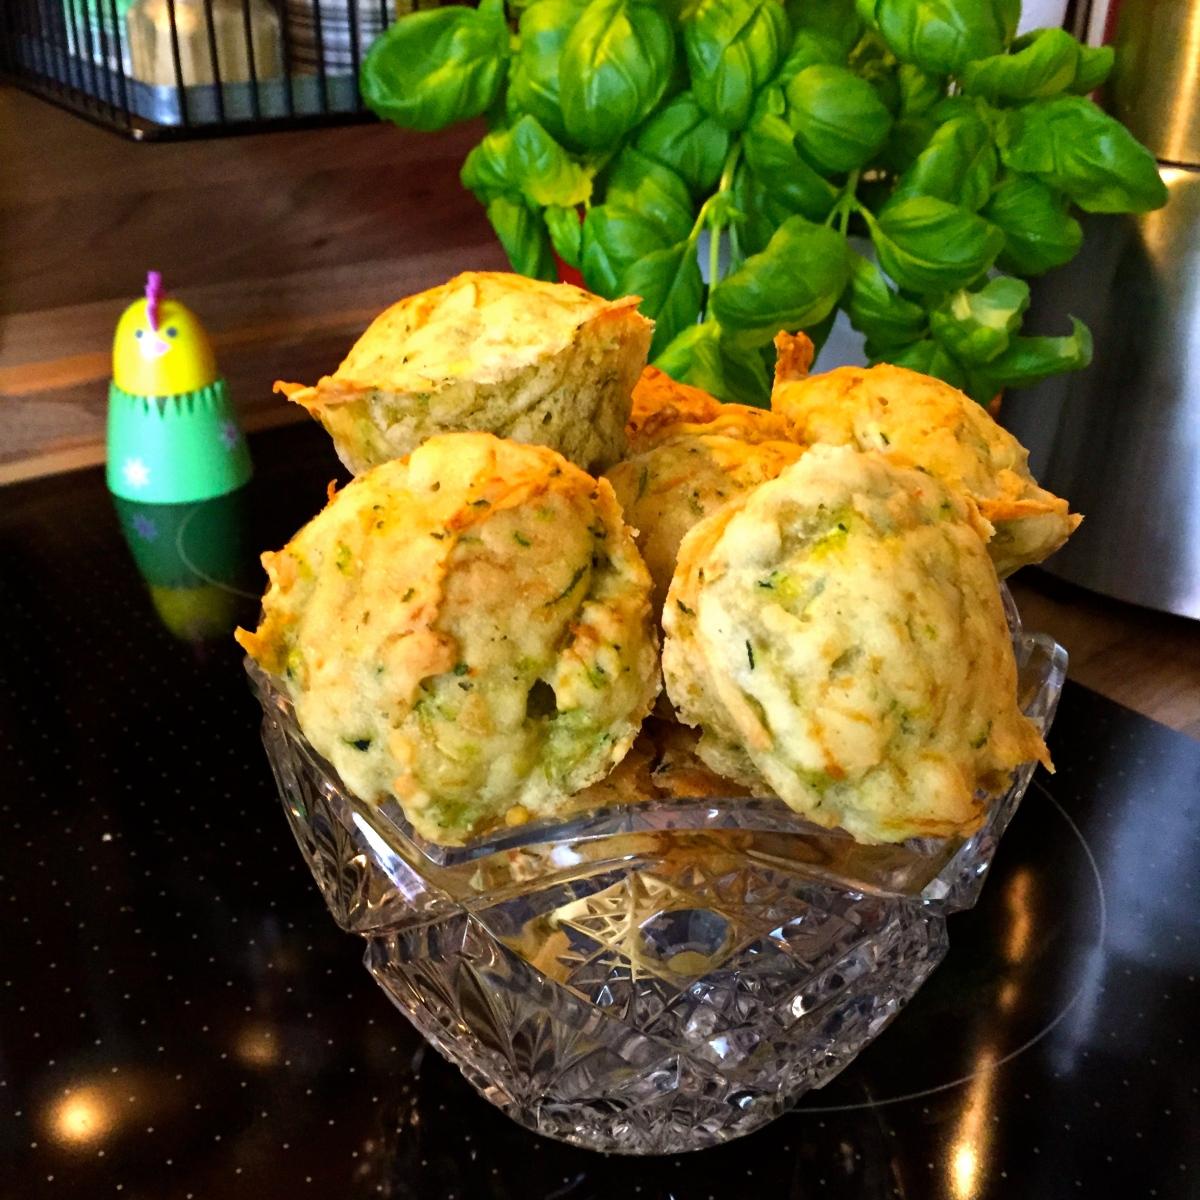 Vegane, glutenfreie Zucchini Muffins - vegan, gluten free zucchini muffins